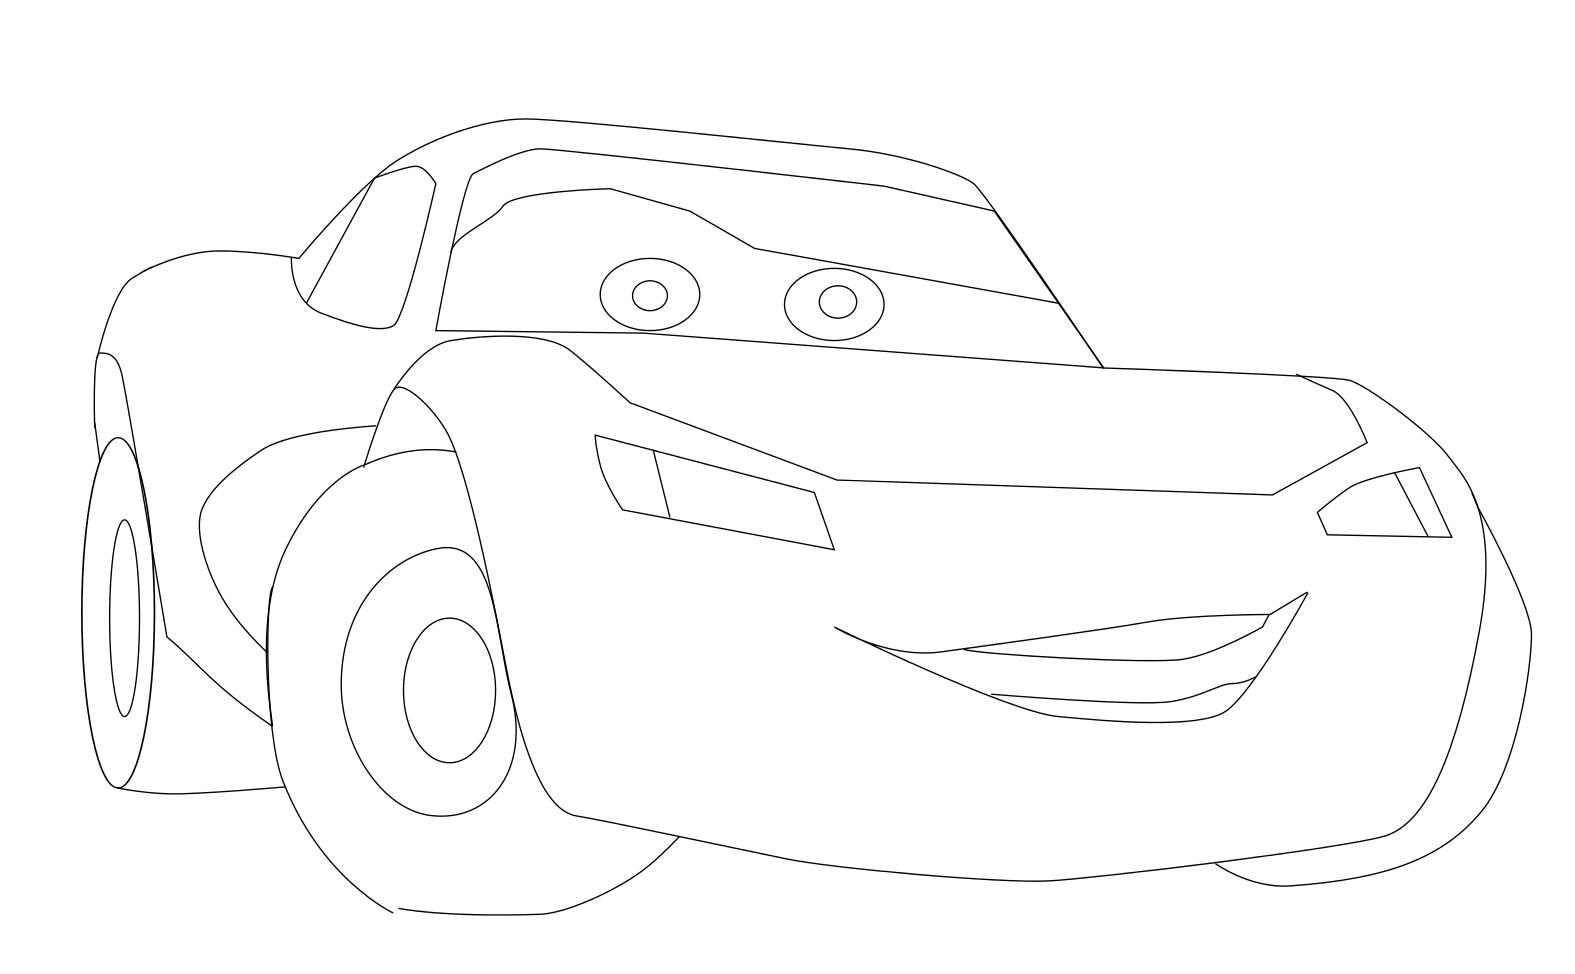 Coloriage cars flash mcqueen imprimer - Coloriage cars flash mcqueen a imprimer ...